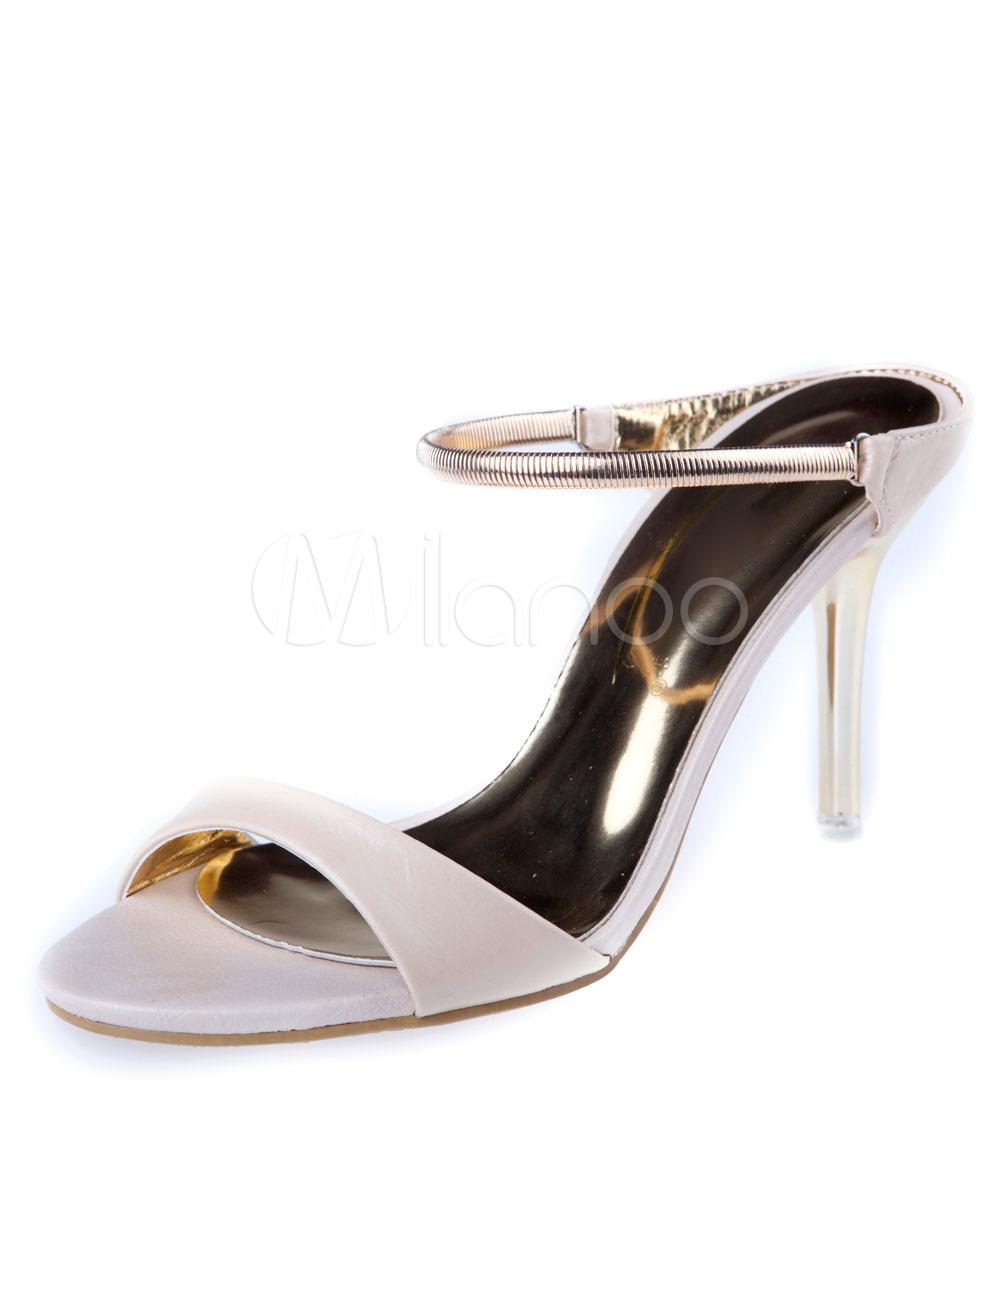 White Sandals Straps PU Heels for Women